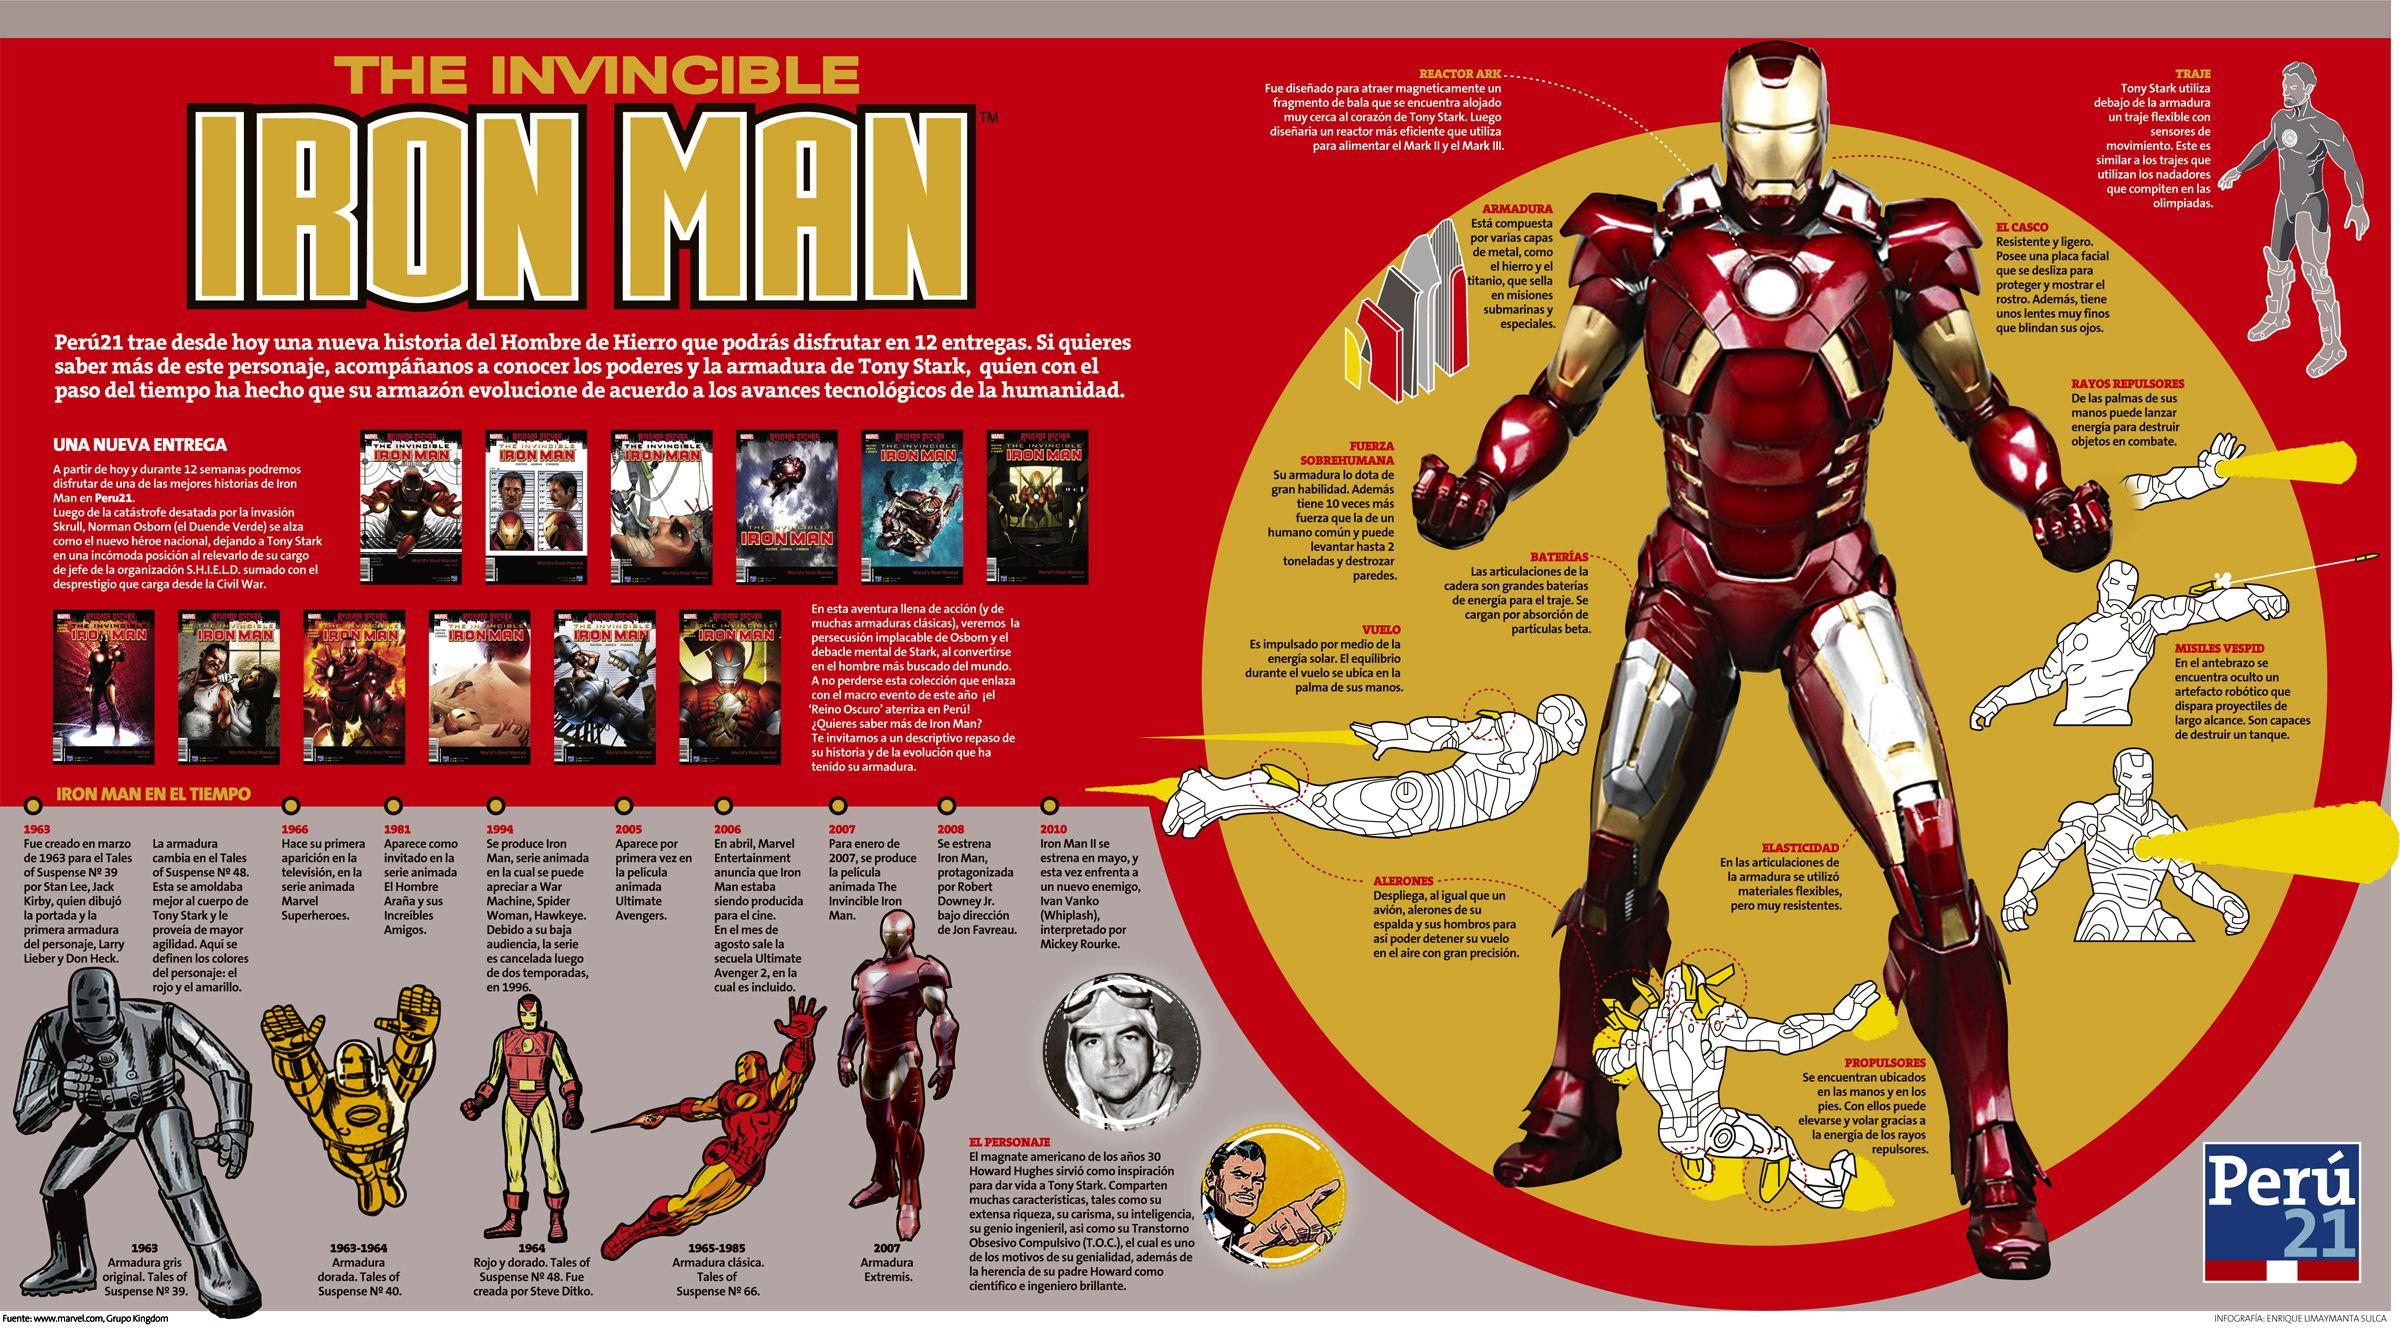 iron-man-info-world-most-wanted.jpg (2400×1331)